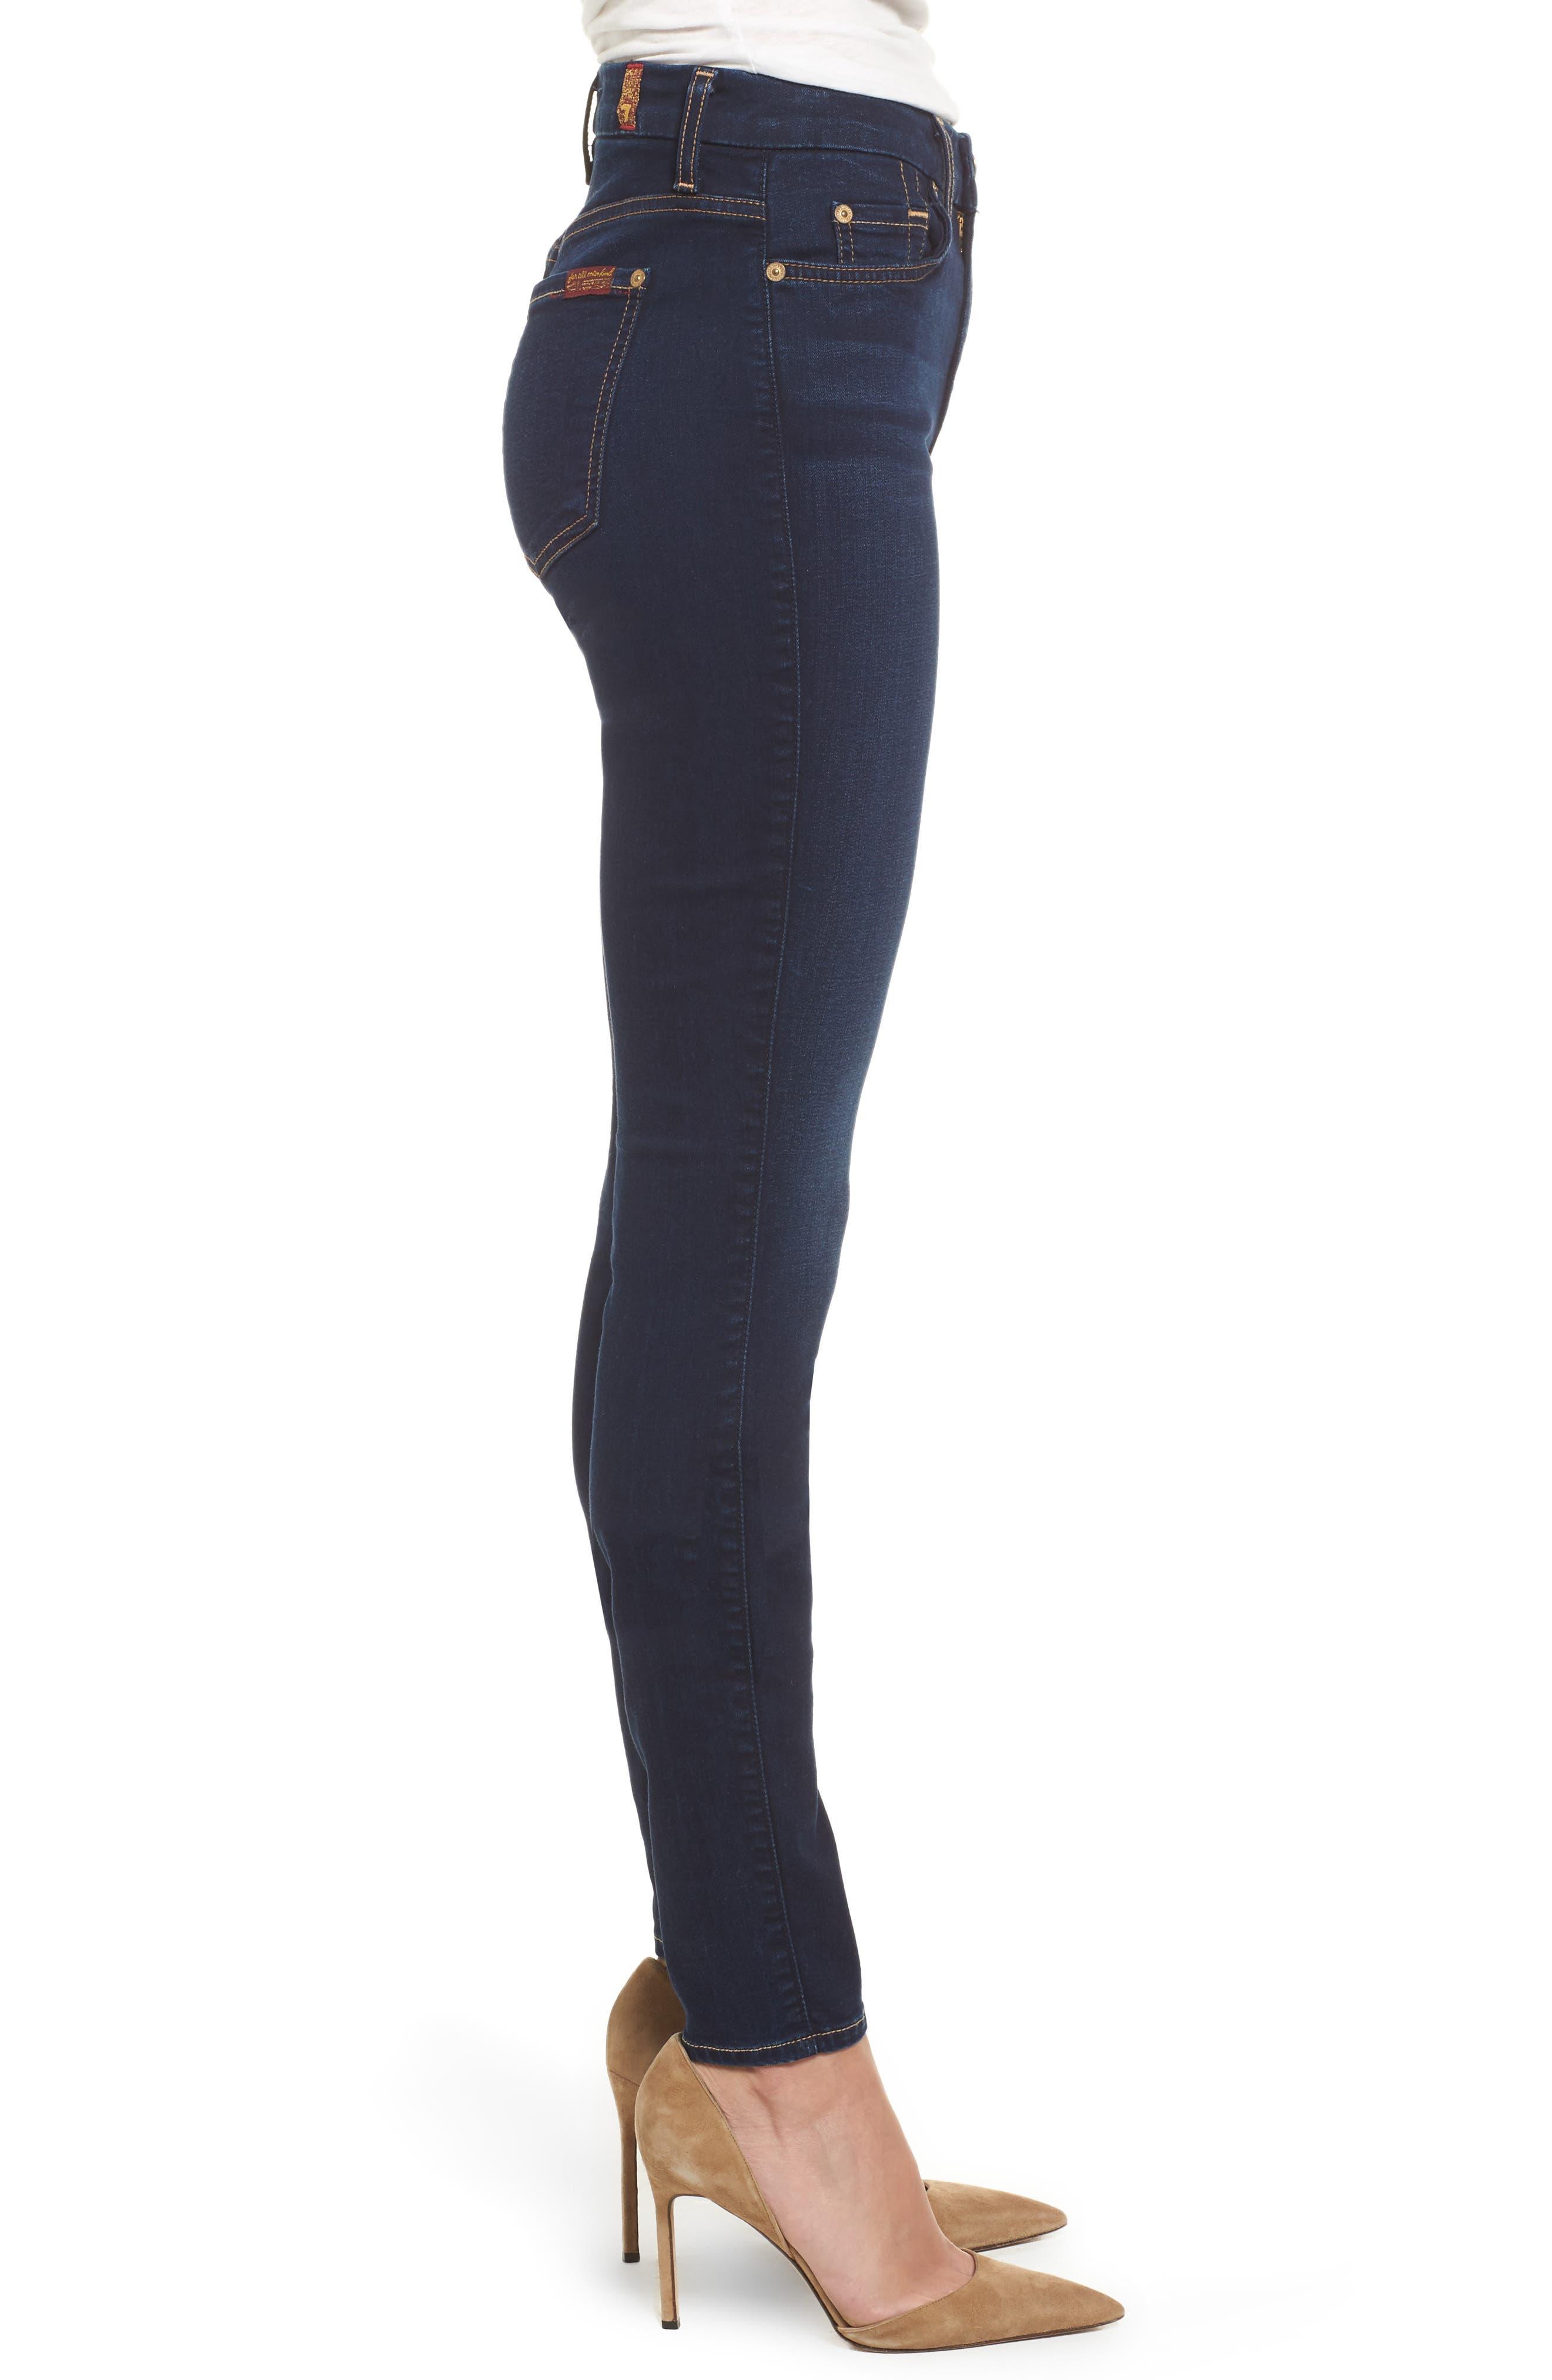 b(air) High Waist Skinny Jeans,                             Alternate thumbnail 3, color,                             400